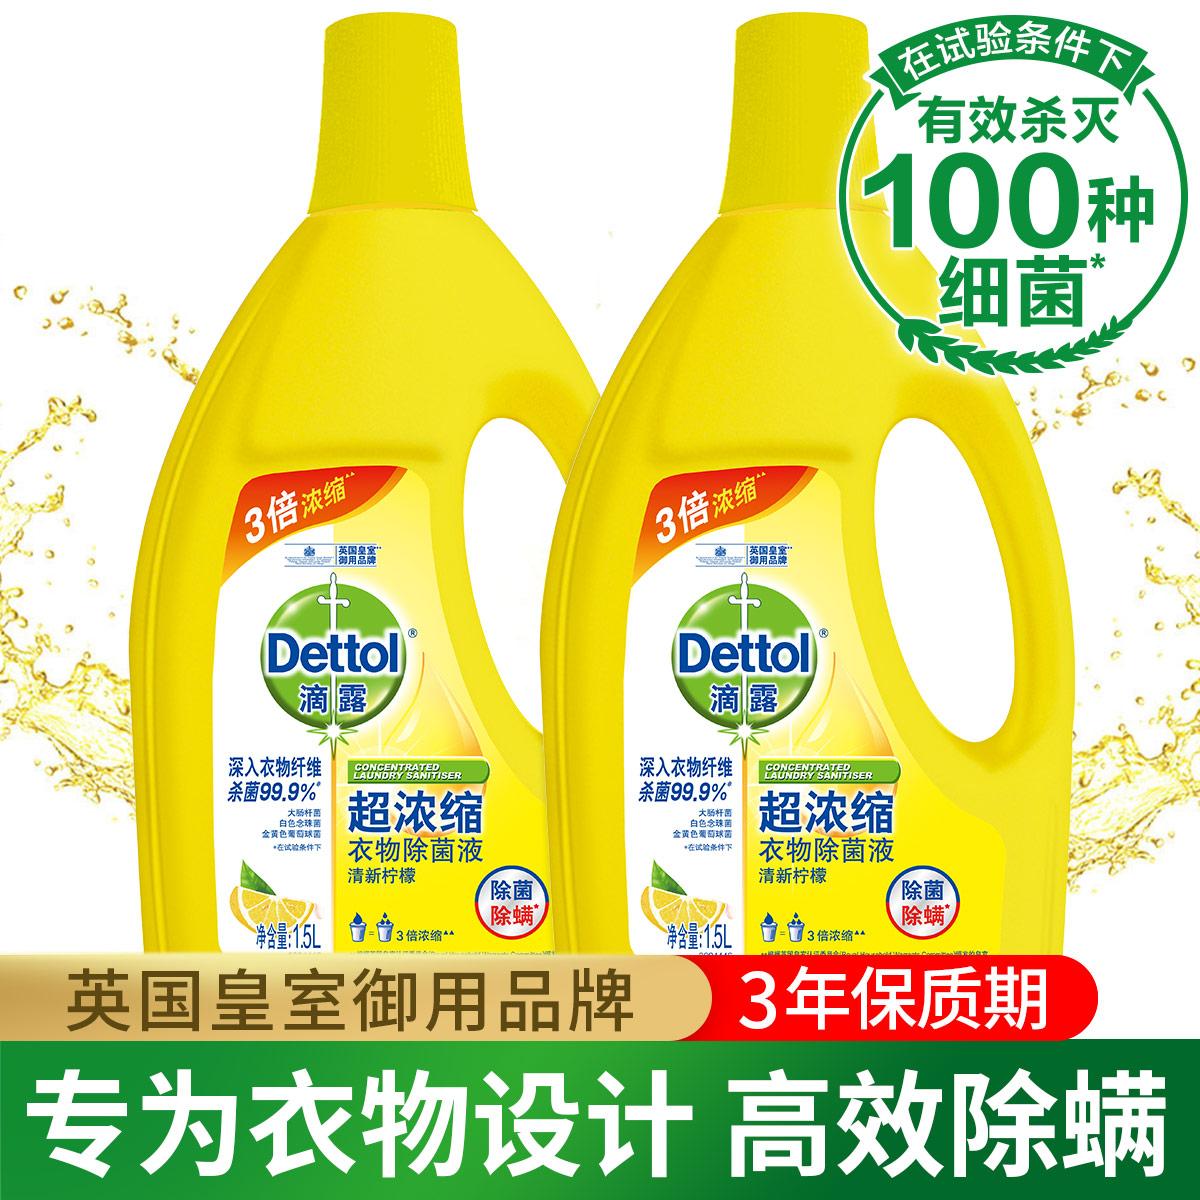 Dettol 【3倍浓缩省心省地】杀灭细菌100种 滴露超浓缩衣物除菌液1.5L*2